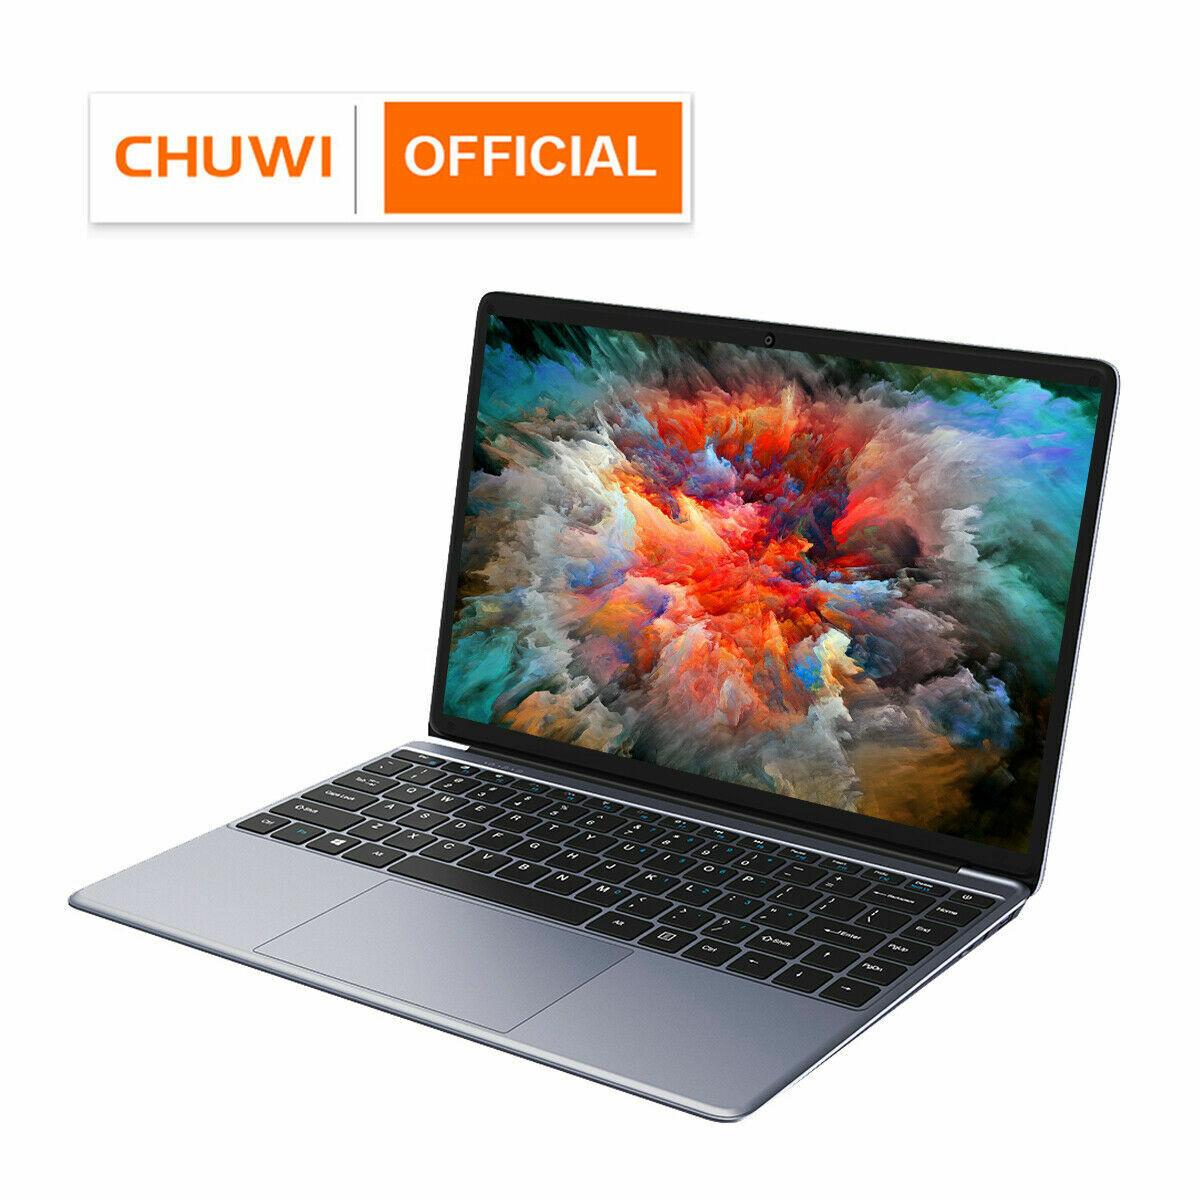 CHUWI HeroBook Pro 14.1 in Laptop Windows 10 Intel Dual Core